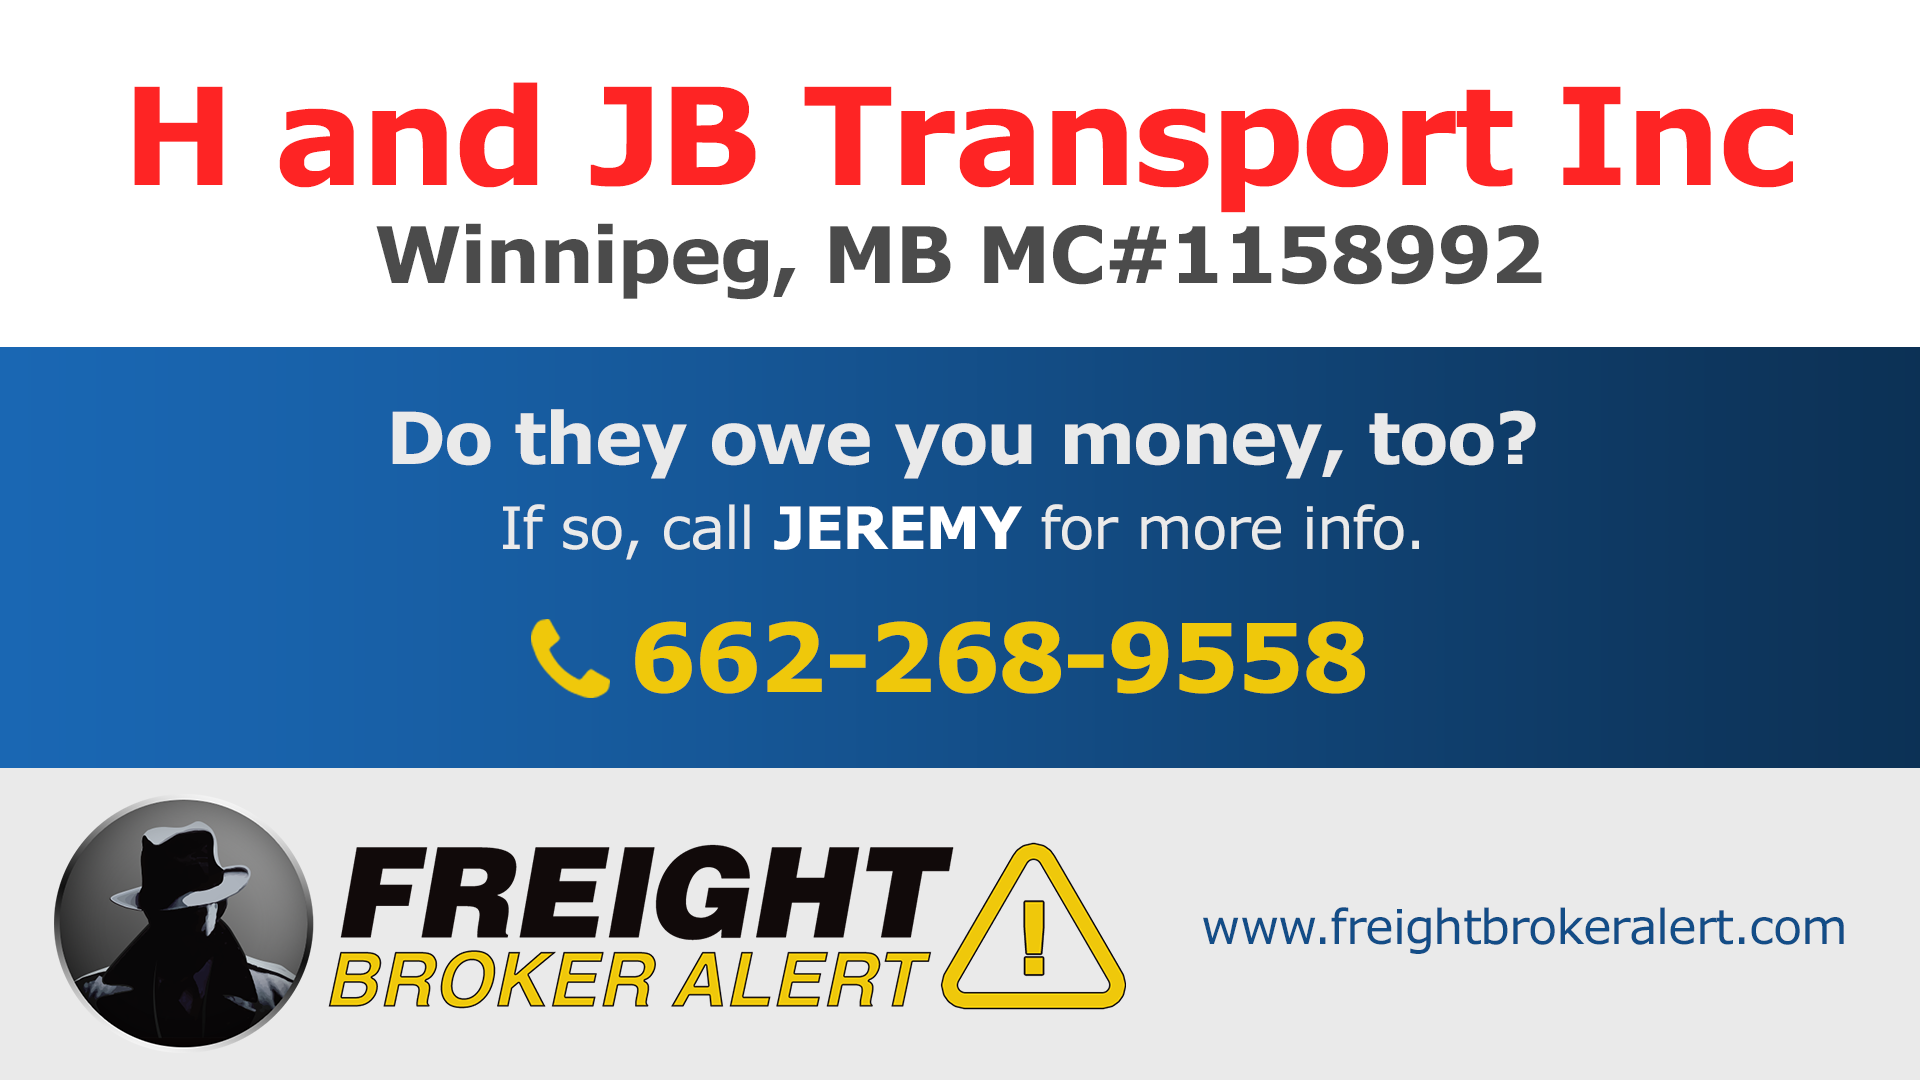 H and JB Transport Inc Manitoba